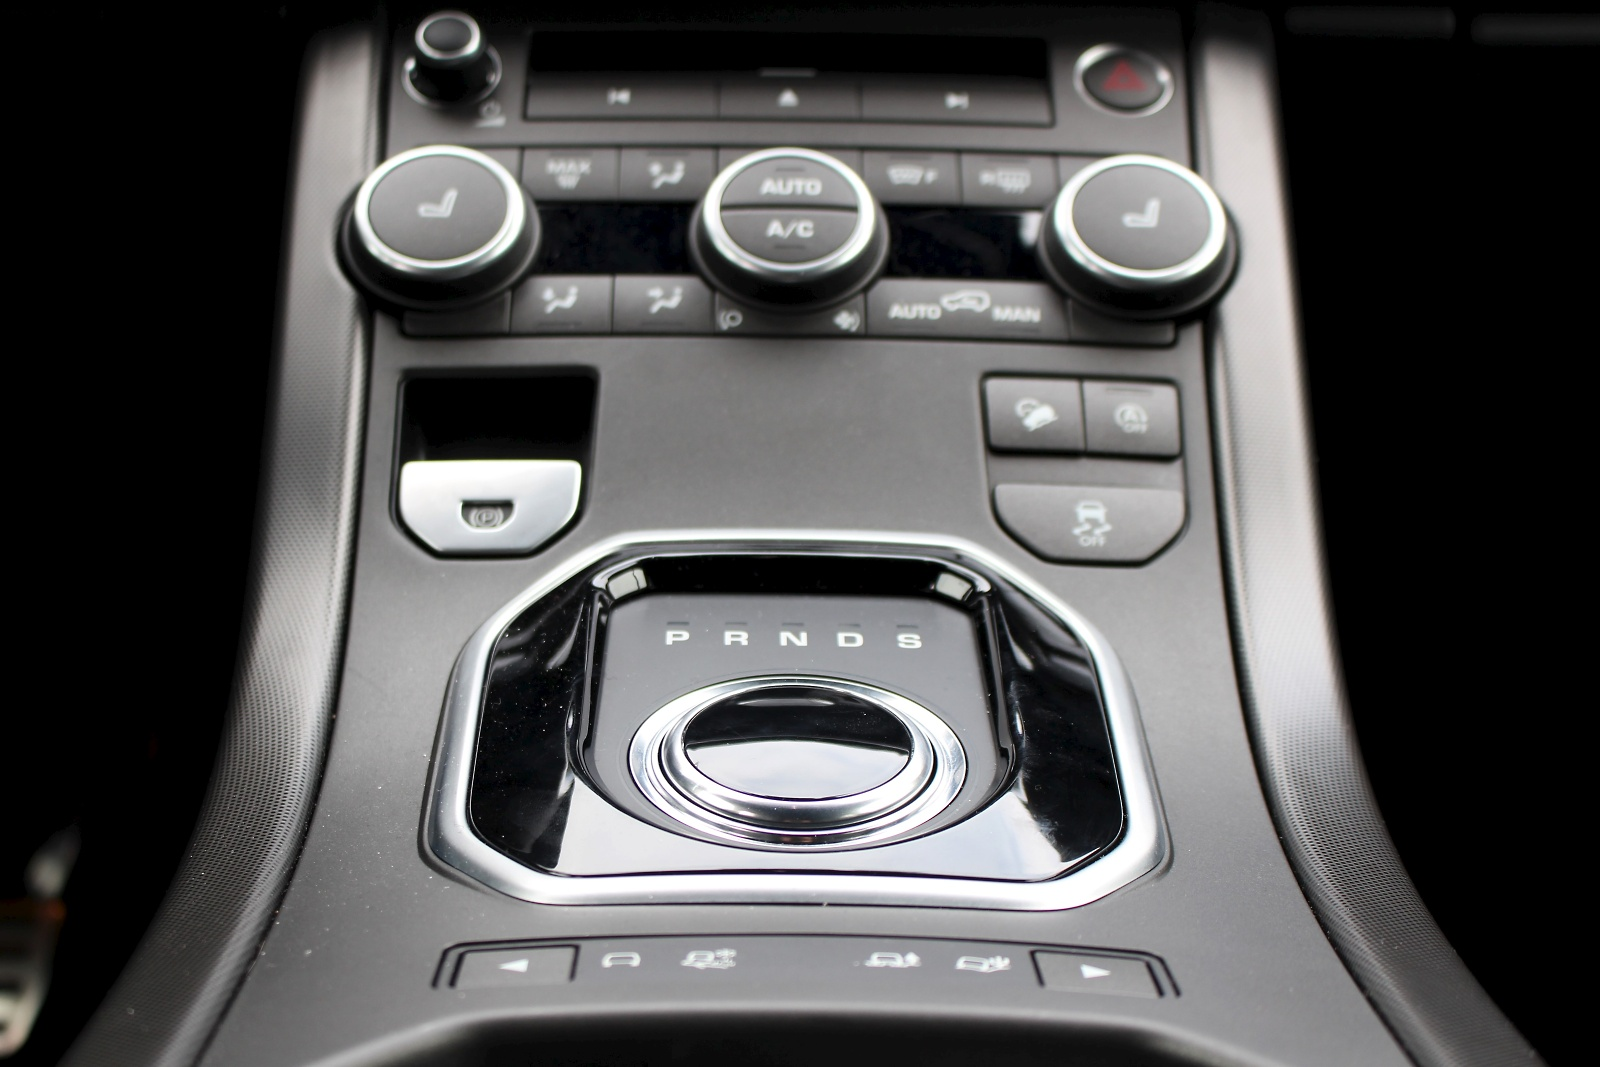 test range rover evoque si4 29 auto. Black Bedroom Furniture Sets. Home Design Ideas